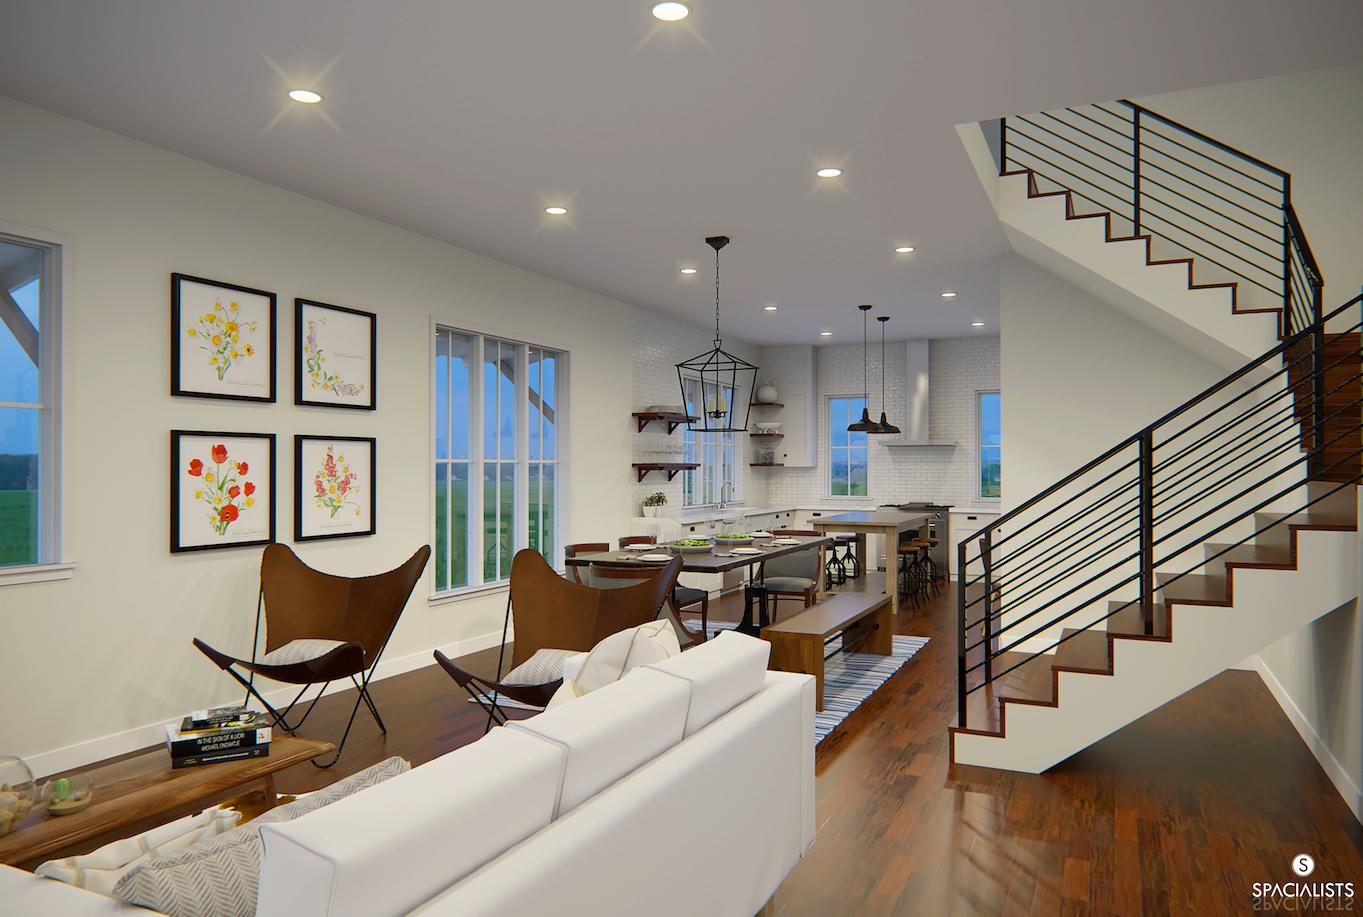 Rendering renderings 3d artist rendition 3d model